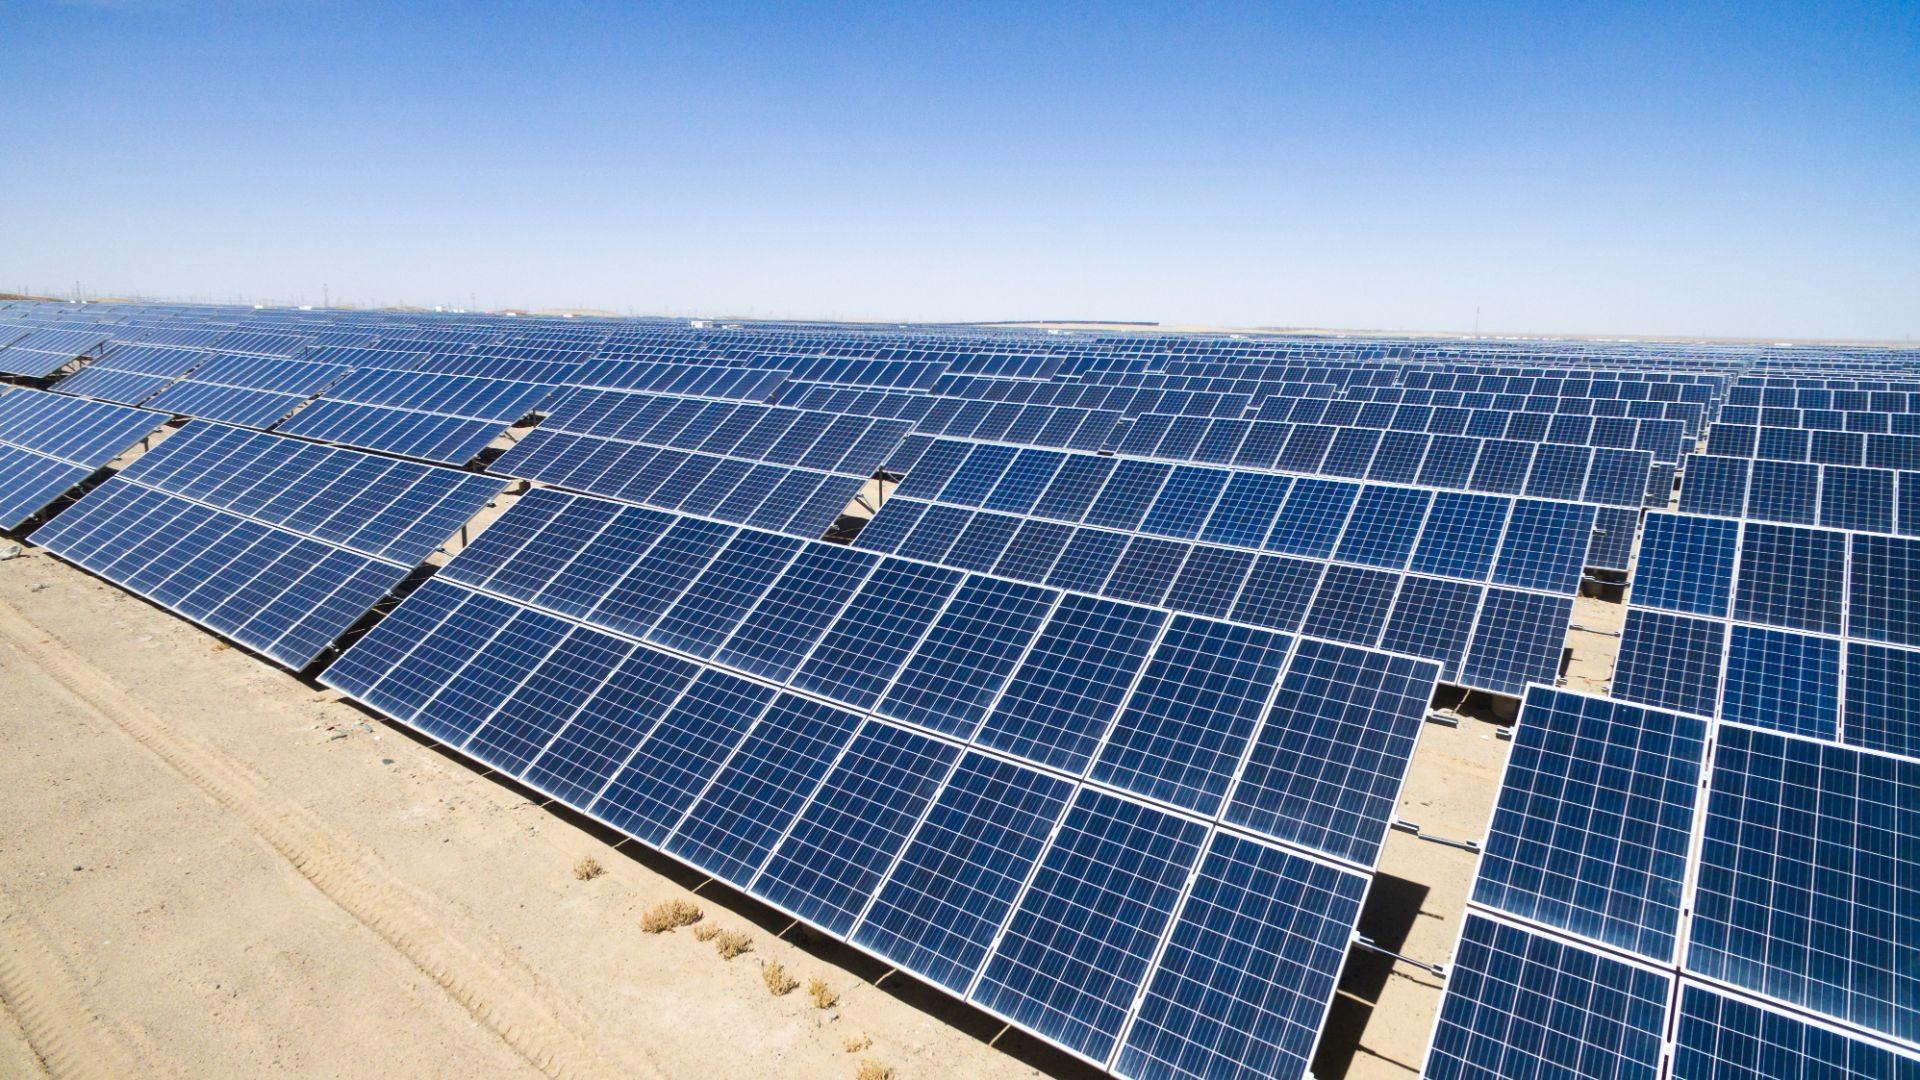 Energías renovables en Málaga